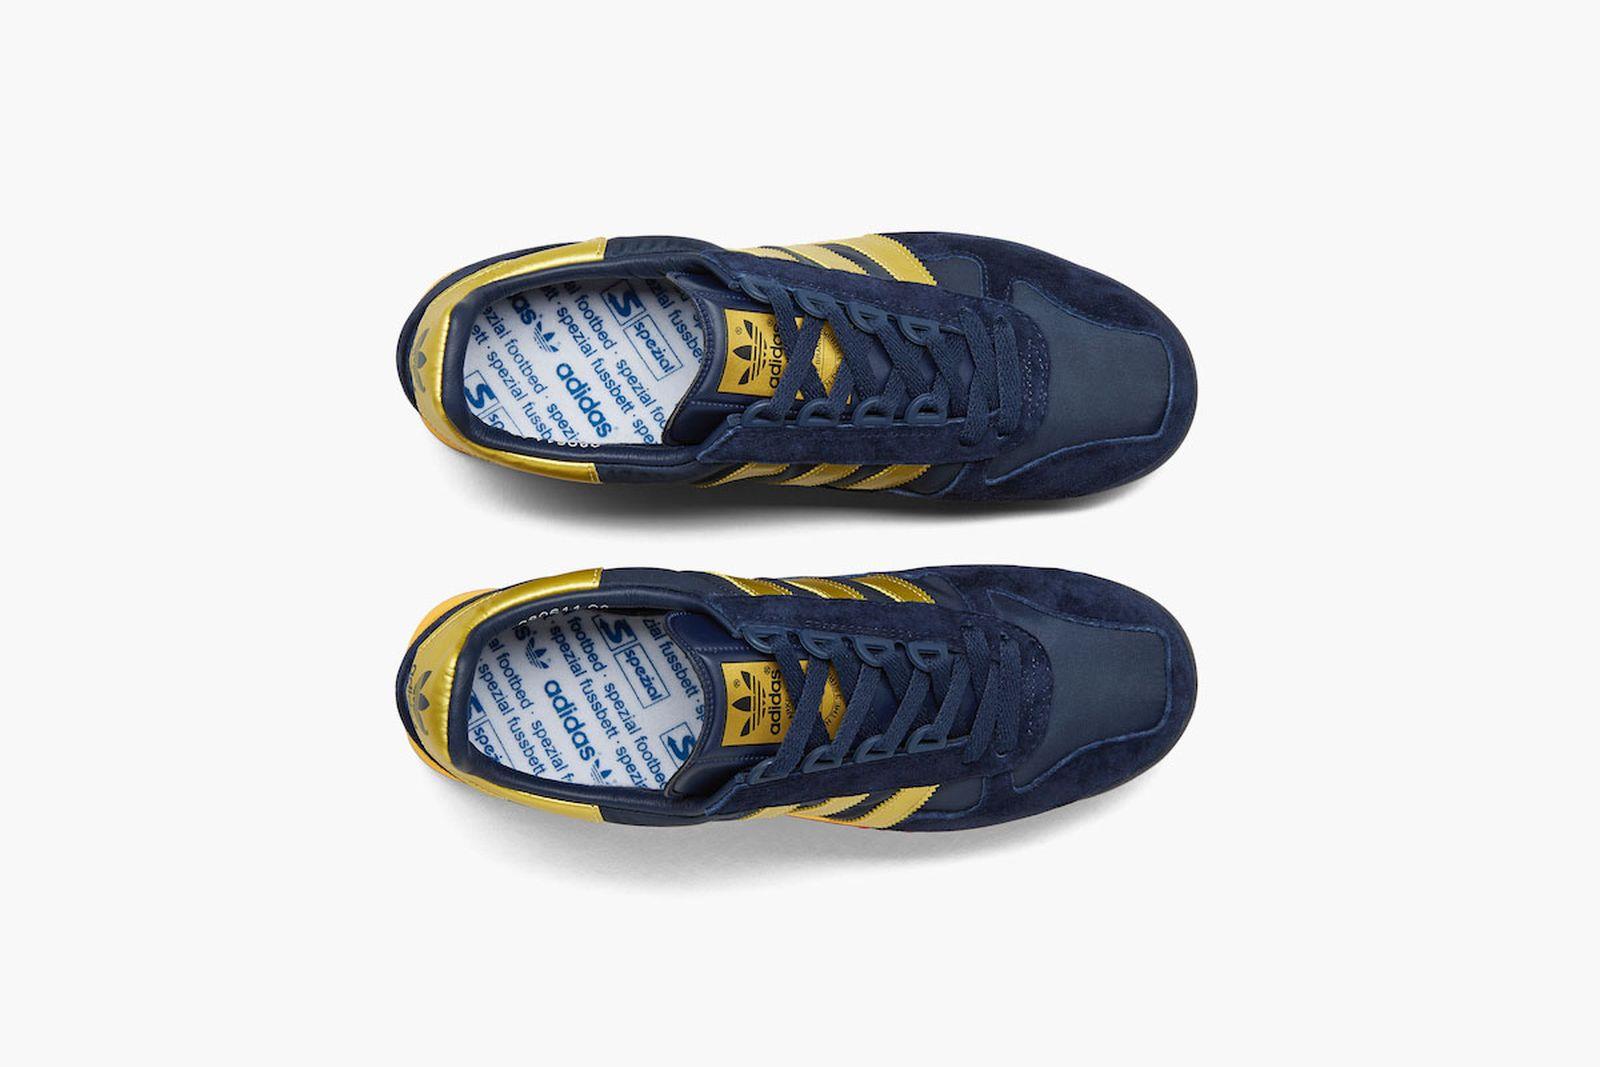 adidas spezial fw19 collection blackburn spzl blackburn spzl